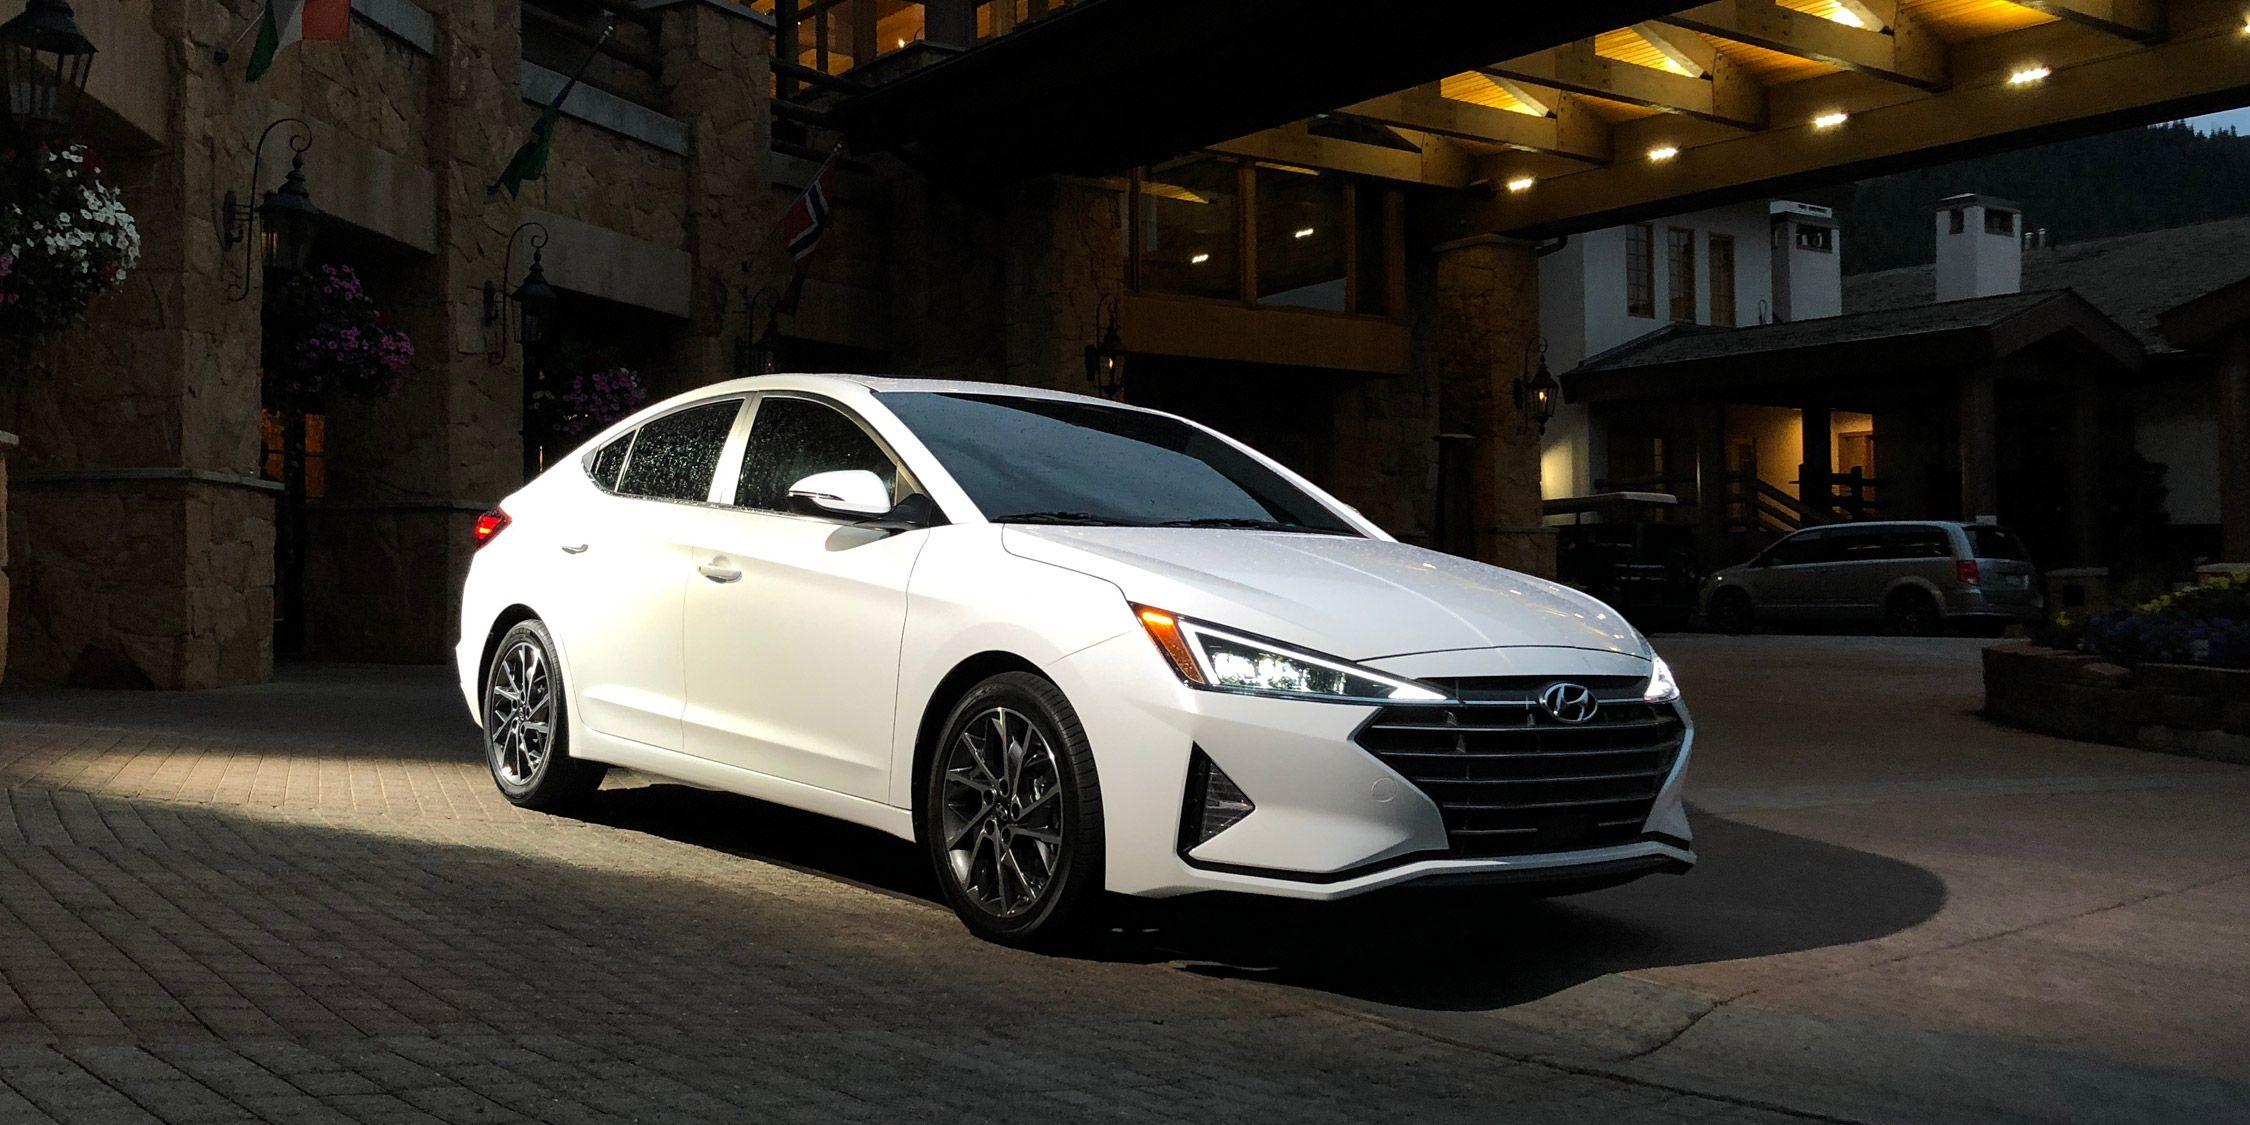 https://www caranddriver com/news/a22799745/2019-hyundai-elantra-sedan/